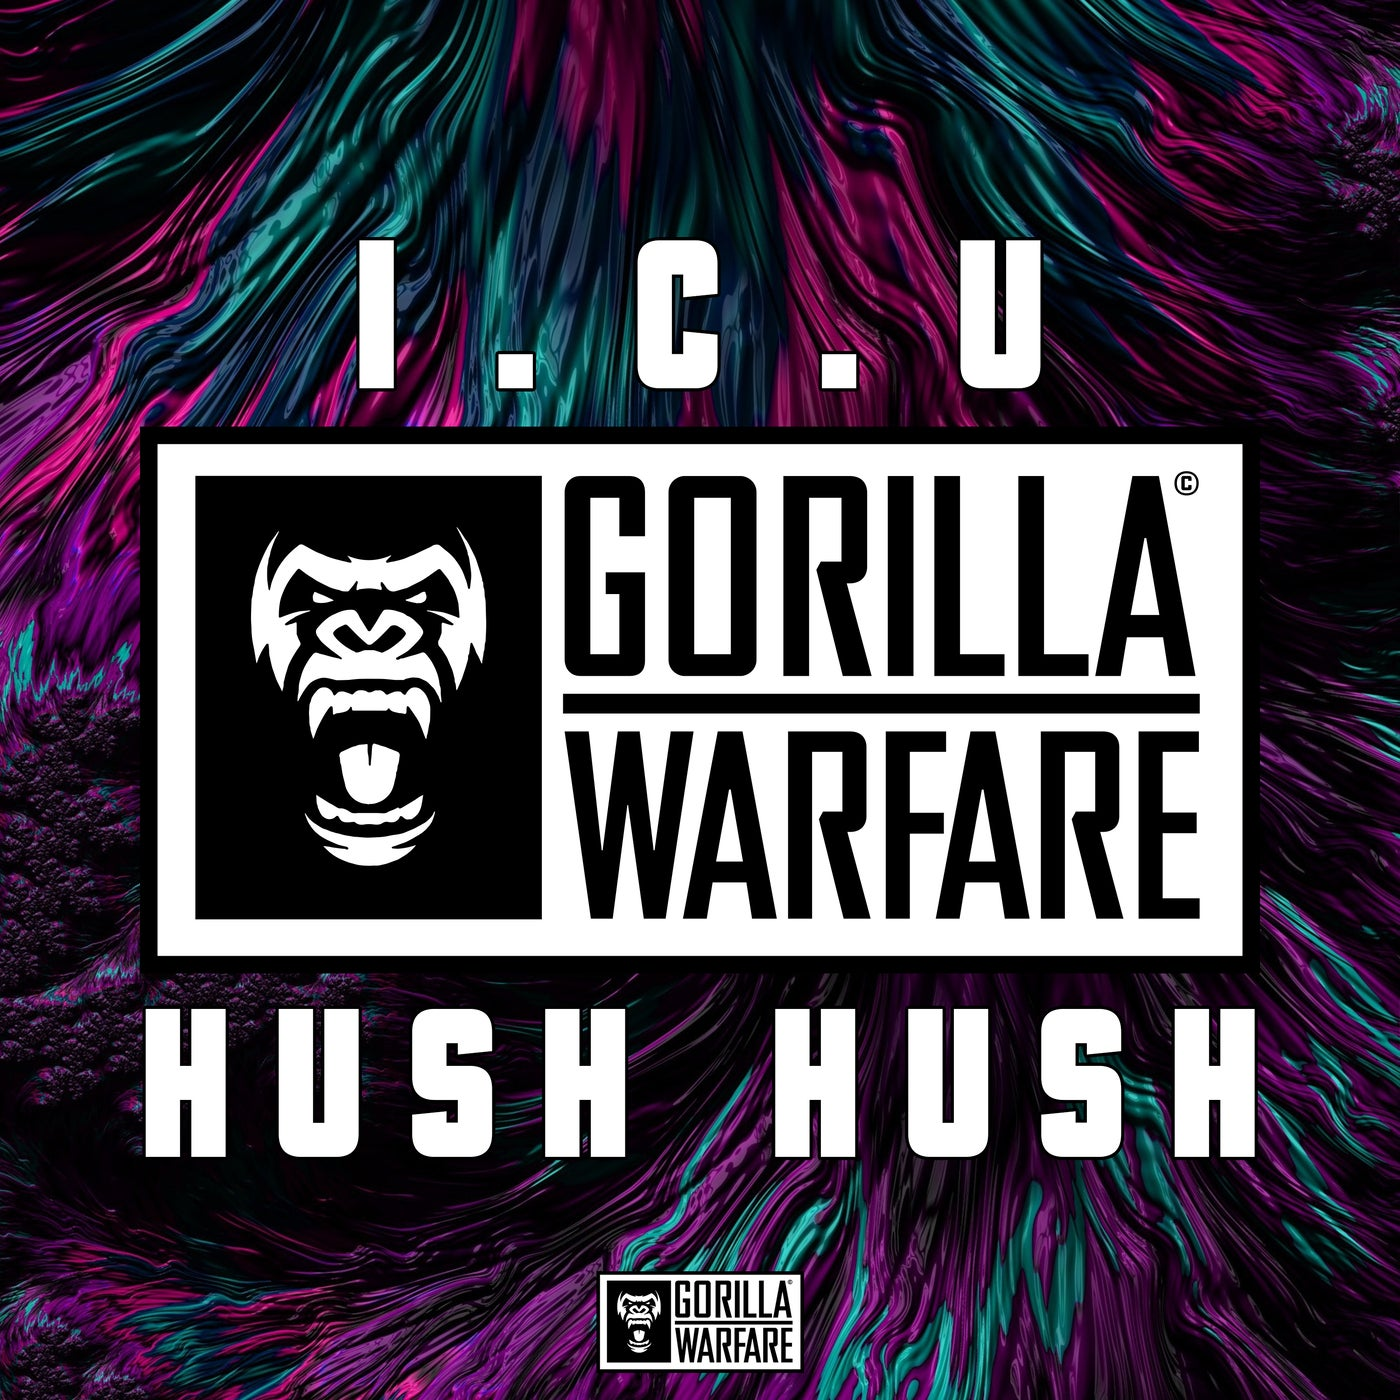 Hush Hush (Original Mix)